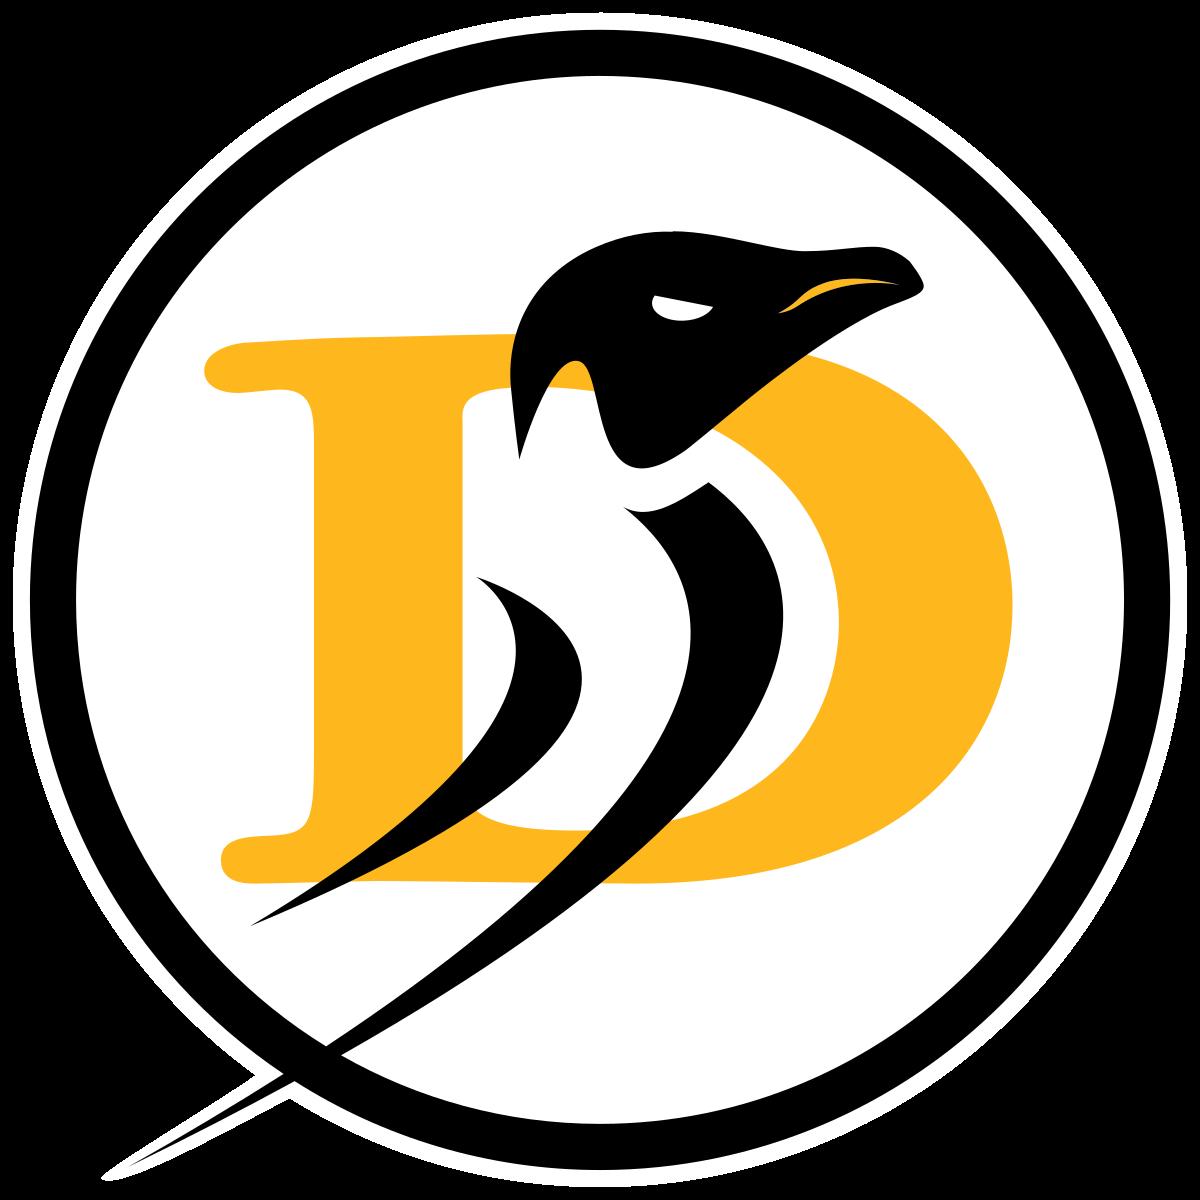 Dominican penguins wikipedia . Clipart penguin soccer